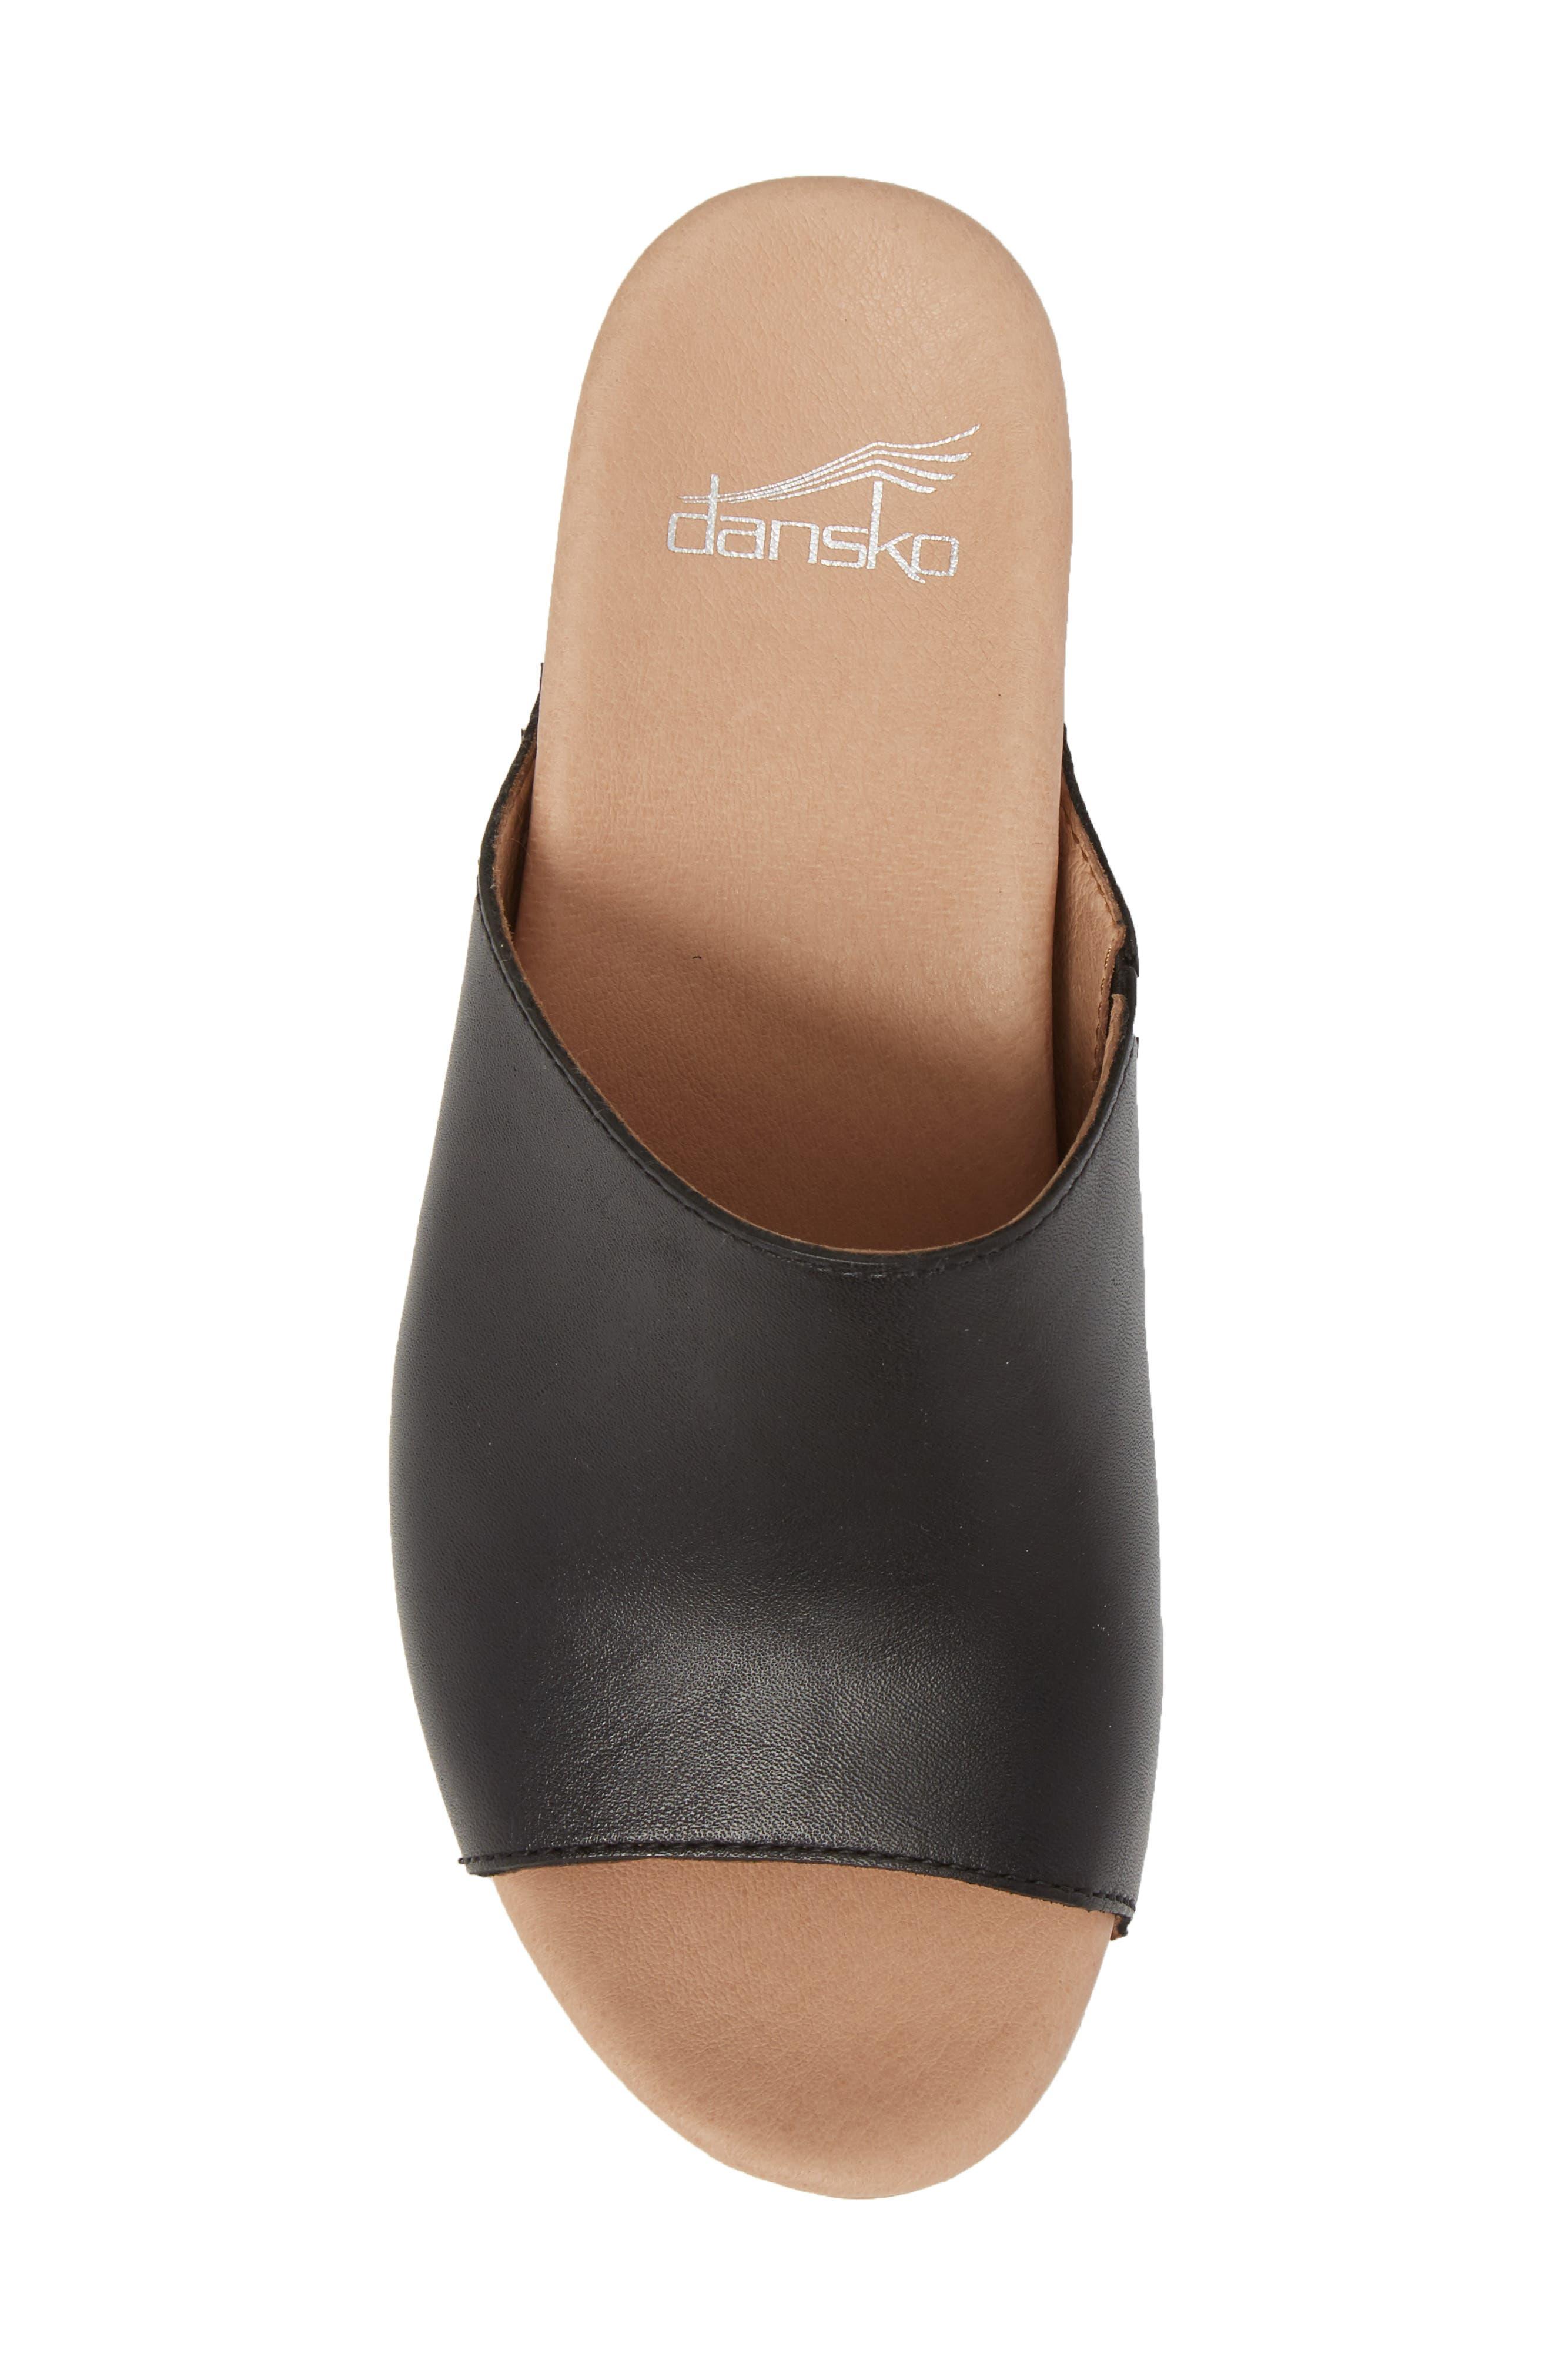 Maci Mule Sandal,                             Alternate thumbnail 5, color,                             BLACK LEATHER